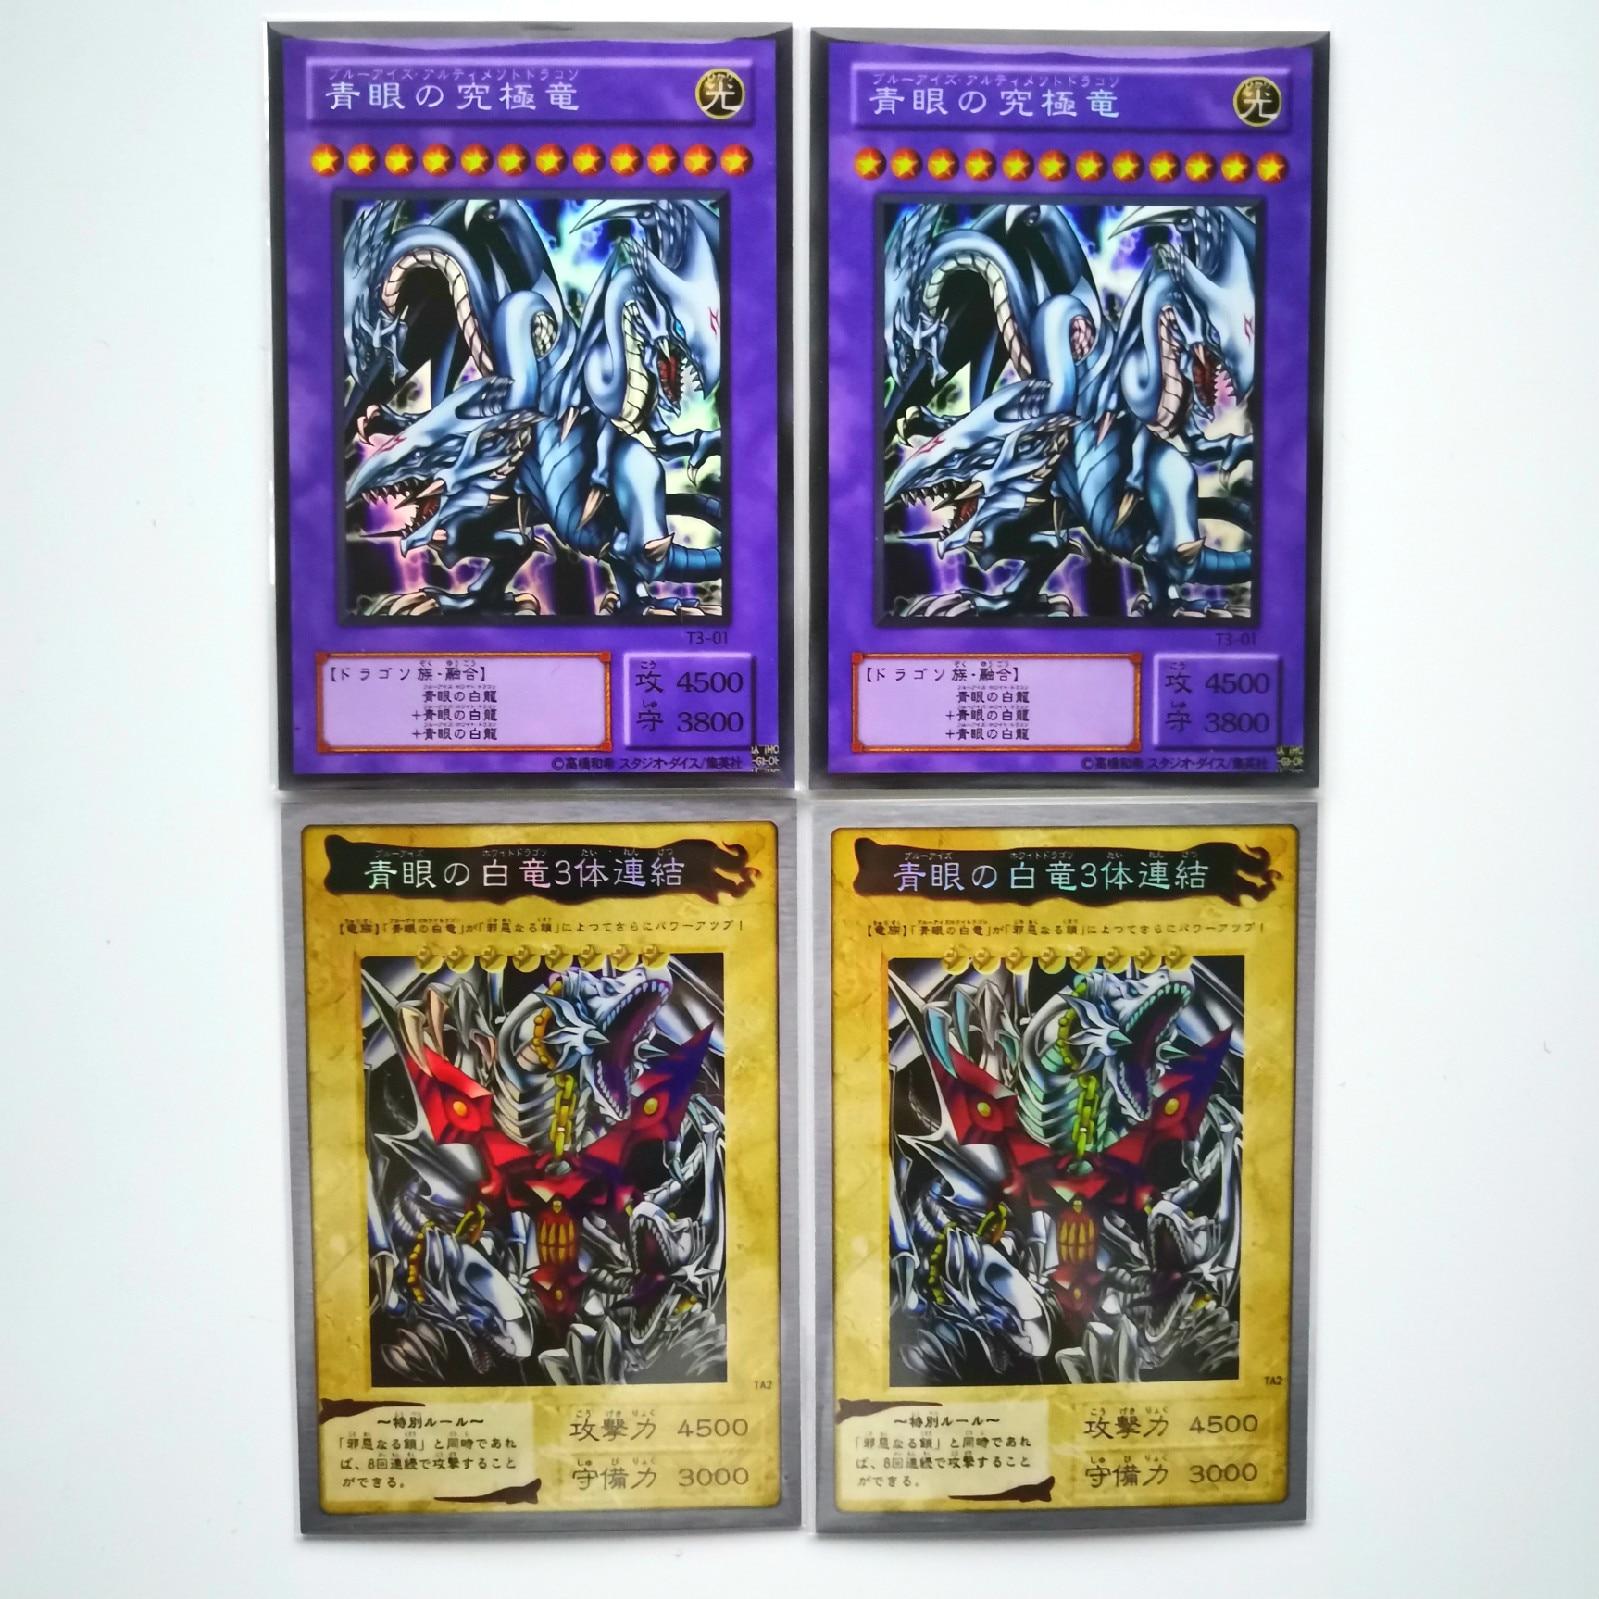 13 Styles Yu Gi Oh yeux bleus blanc ultime Dragon Flash carte jouets loisirs loisirs de Collection jeu Collection Anime cartes